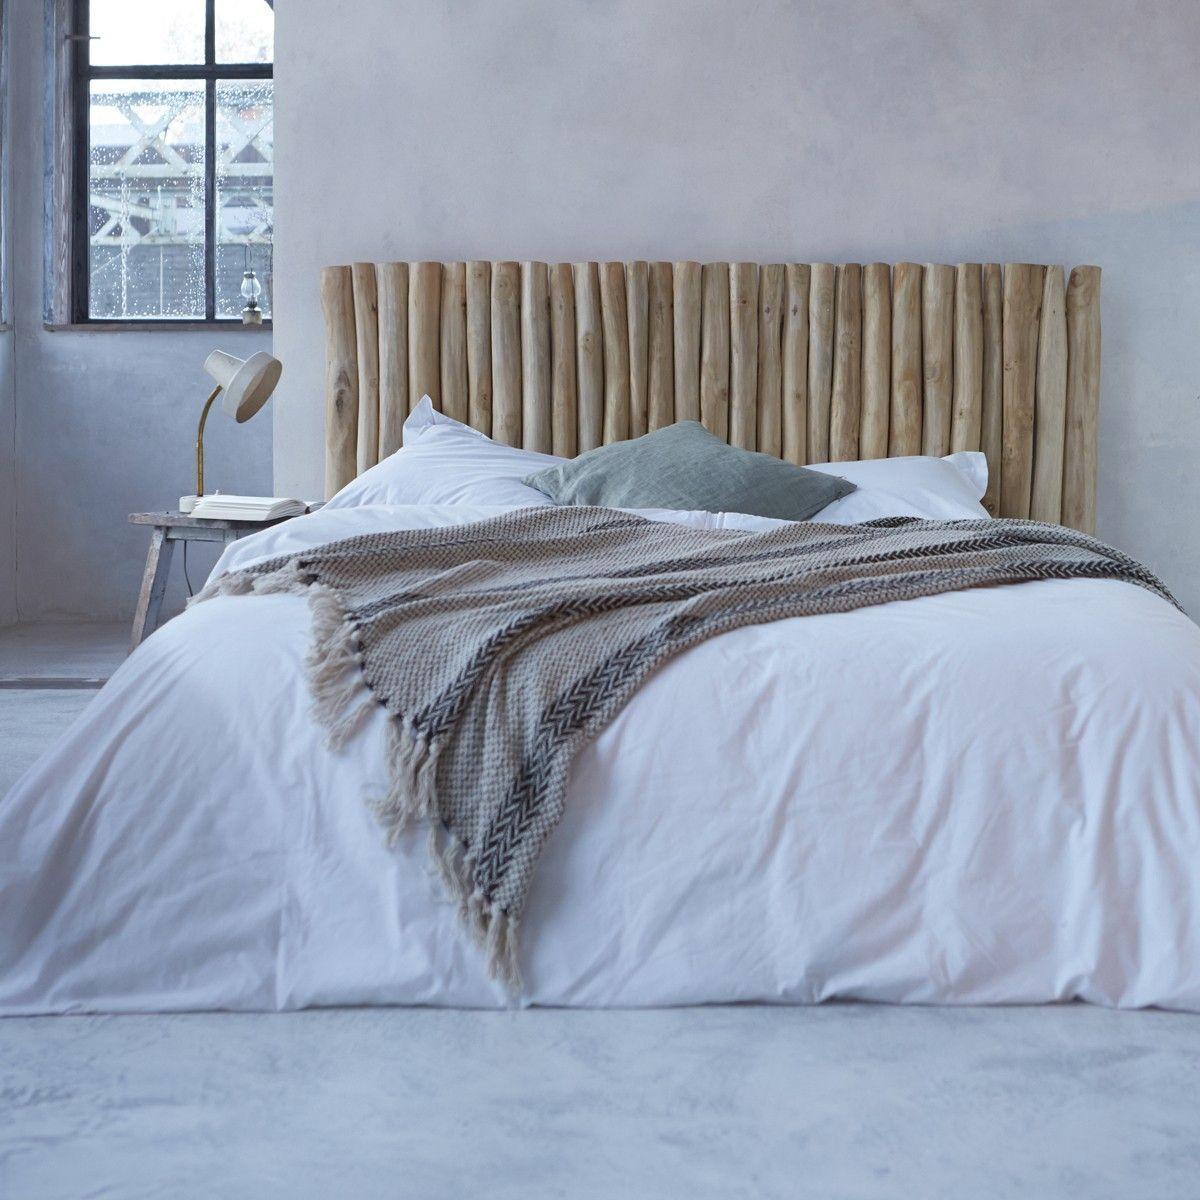 Elegant Driftwood Bead Headboard   River Design Bed Headrest